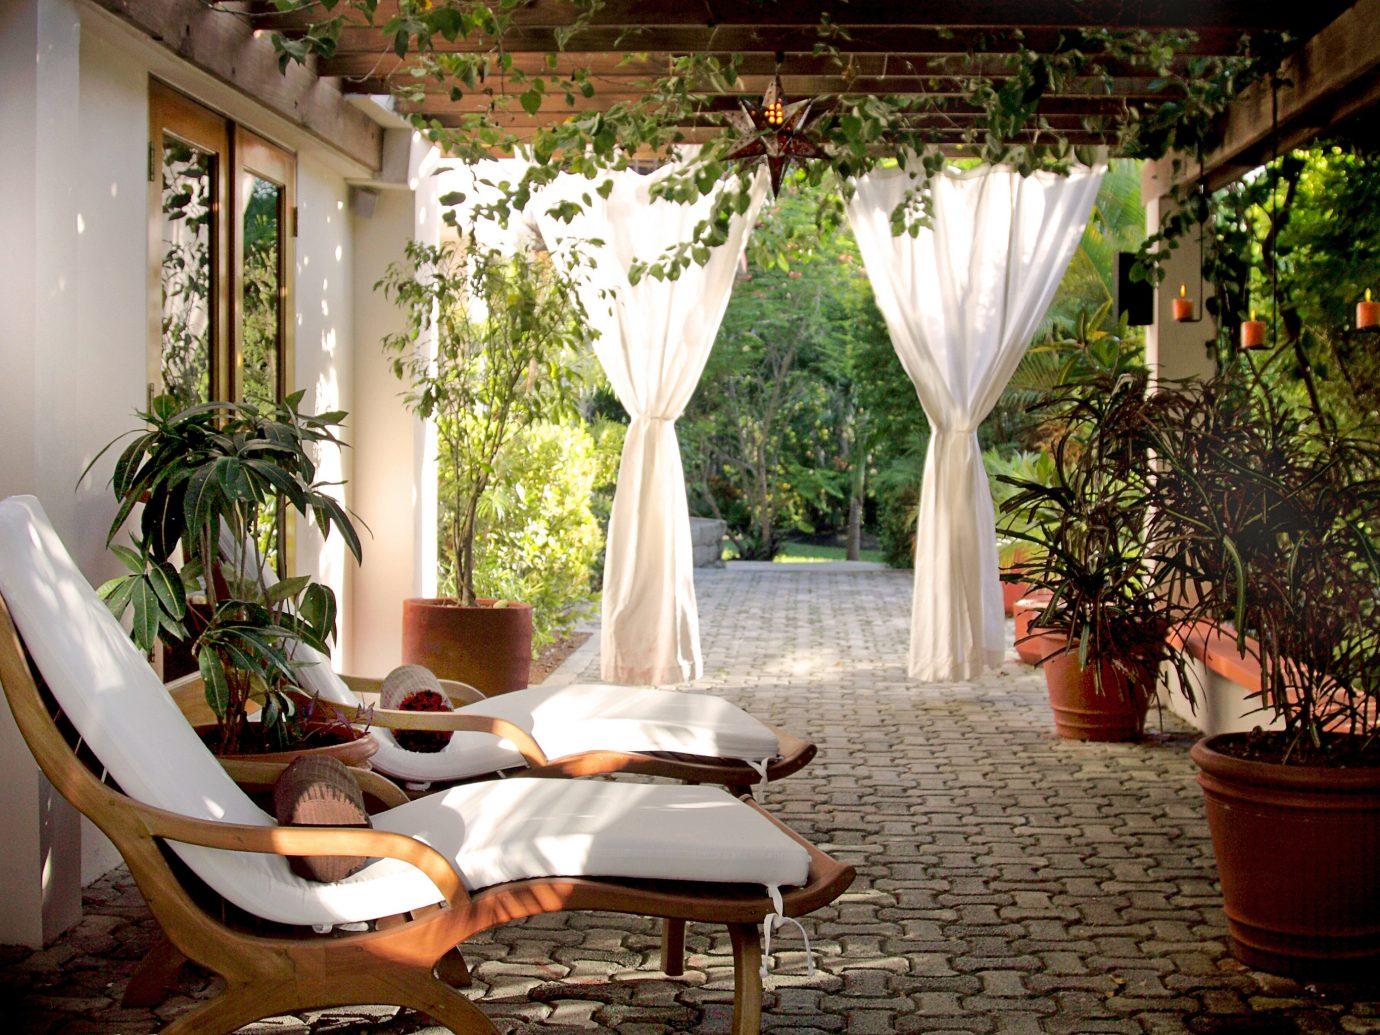 Lounge chairs on a patio at Ka'ana Resort, San Ignacio, Belize